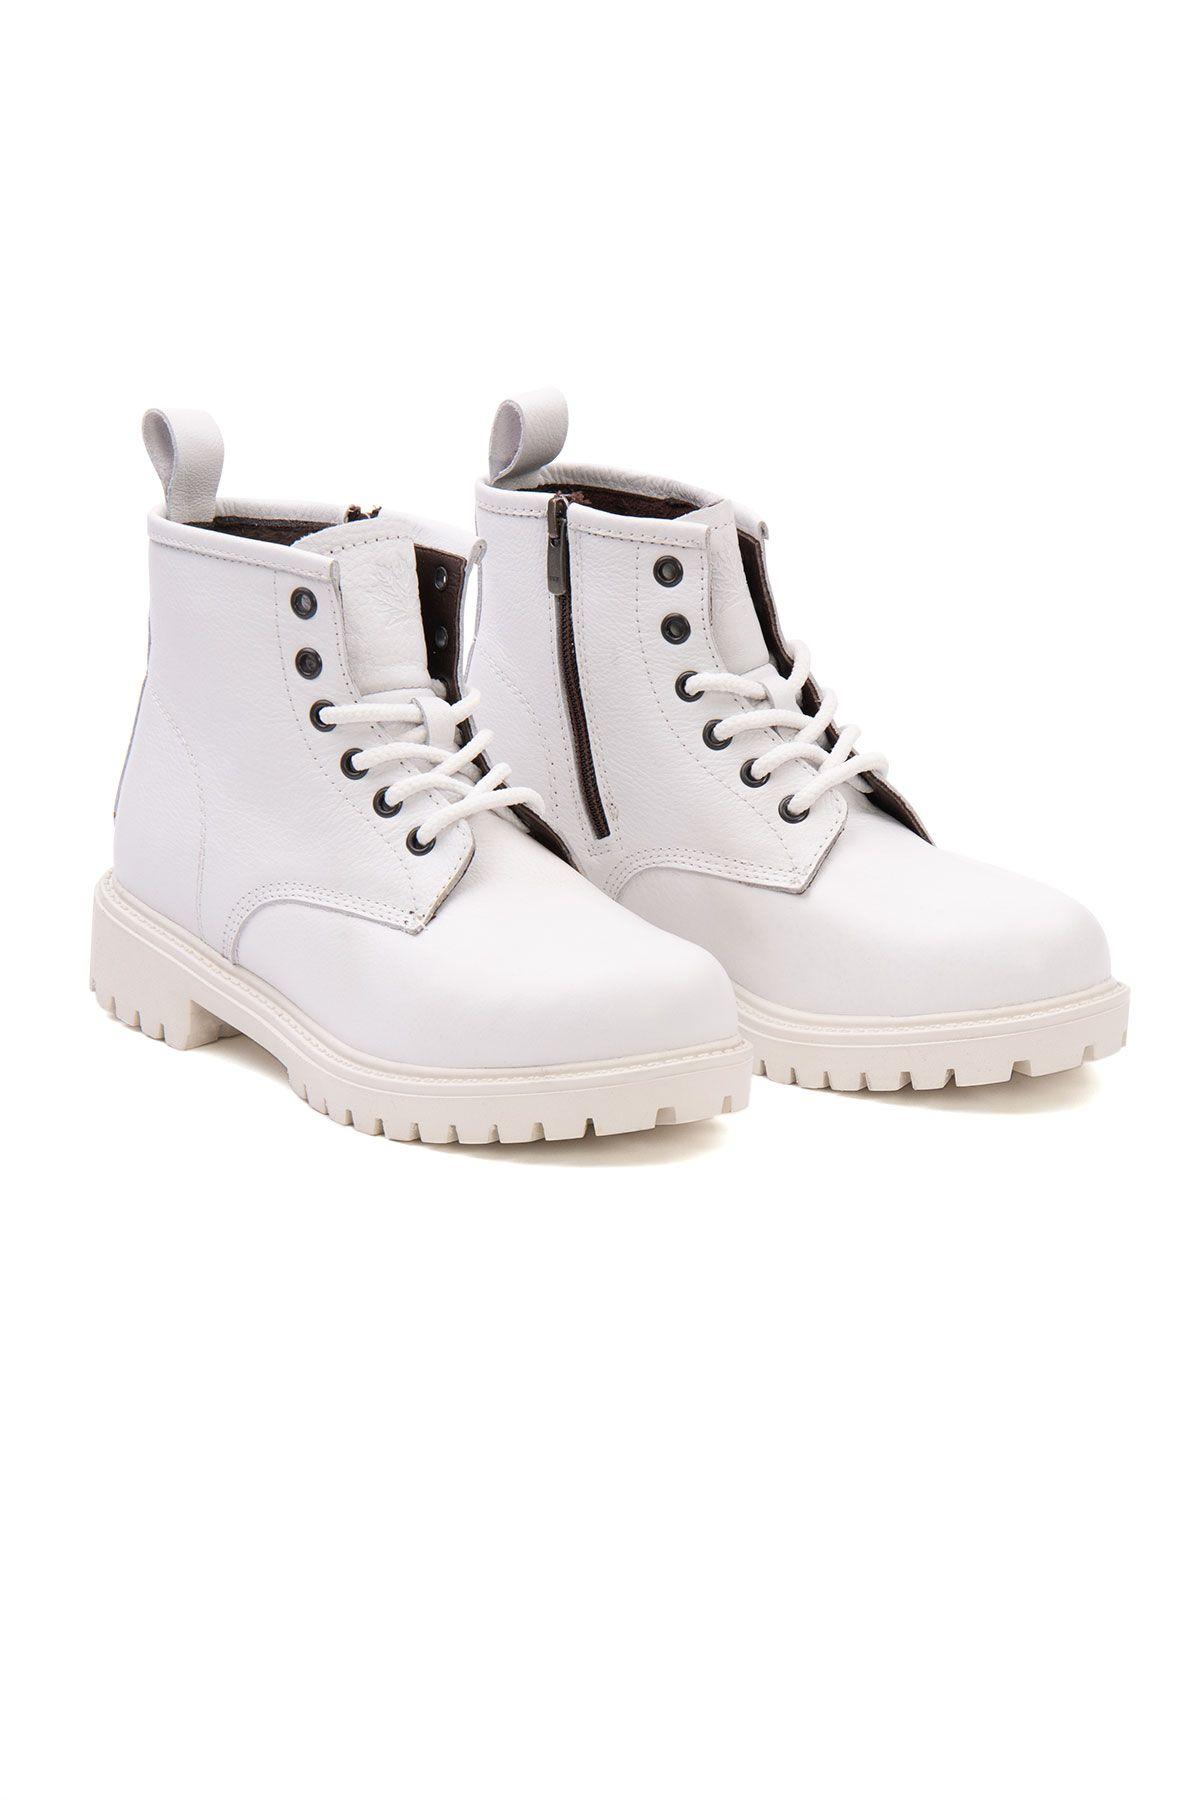 Pegia Genuine Leather Women's Boots 500806 White